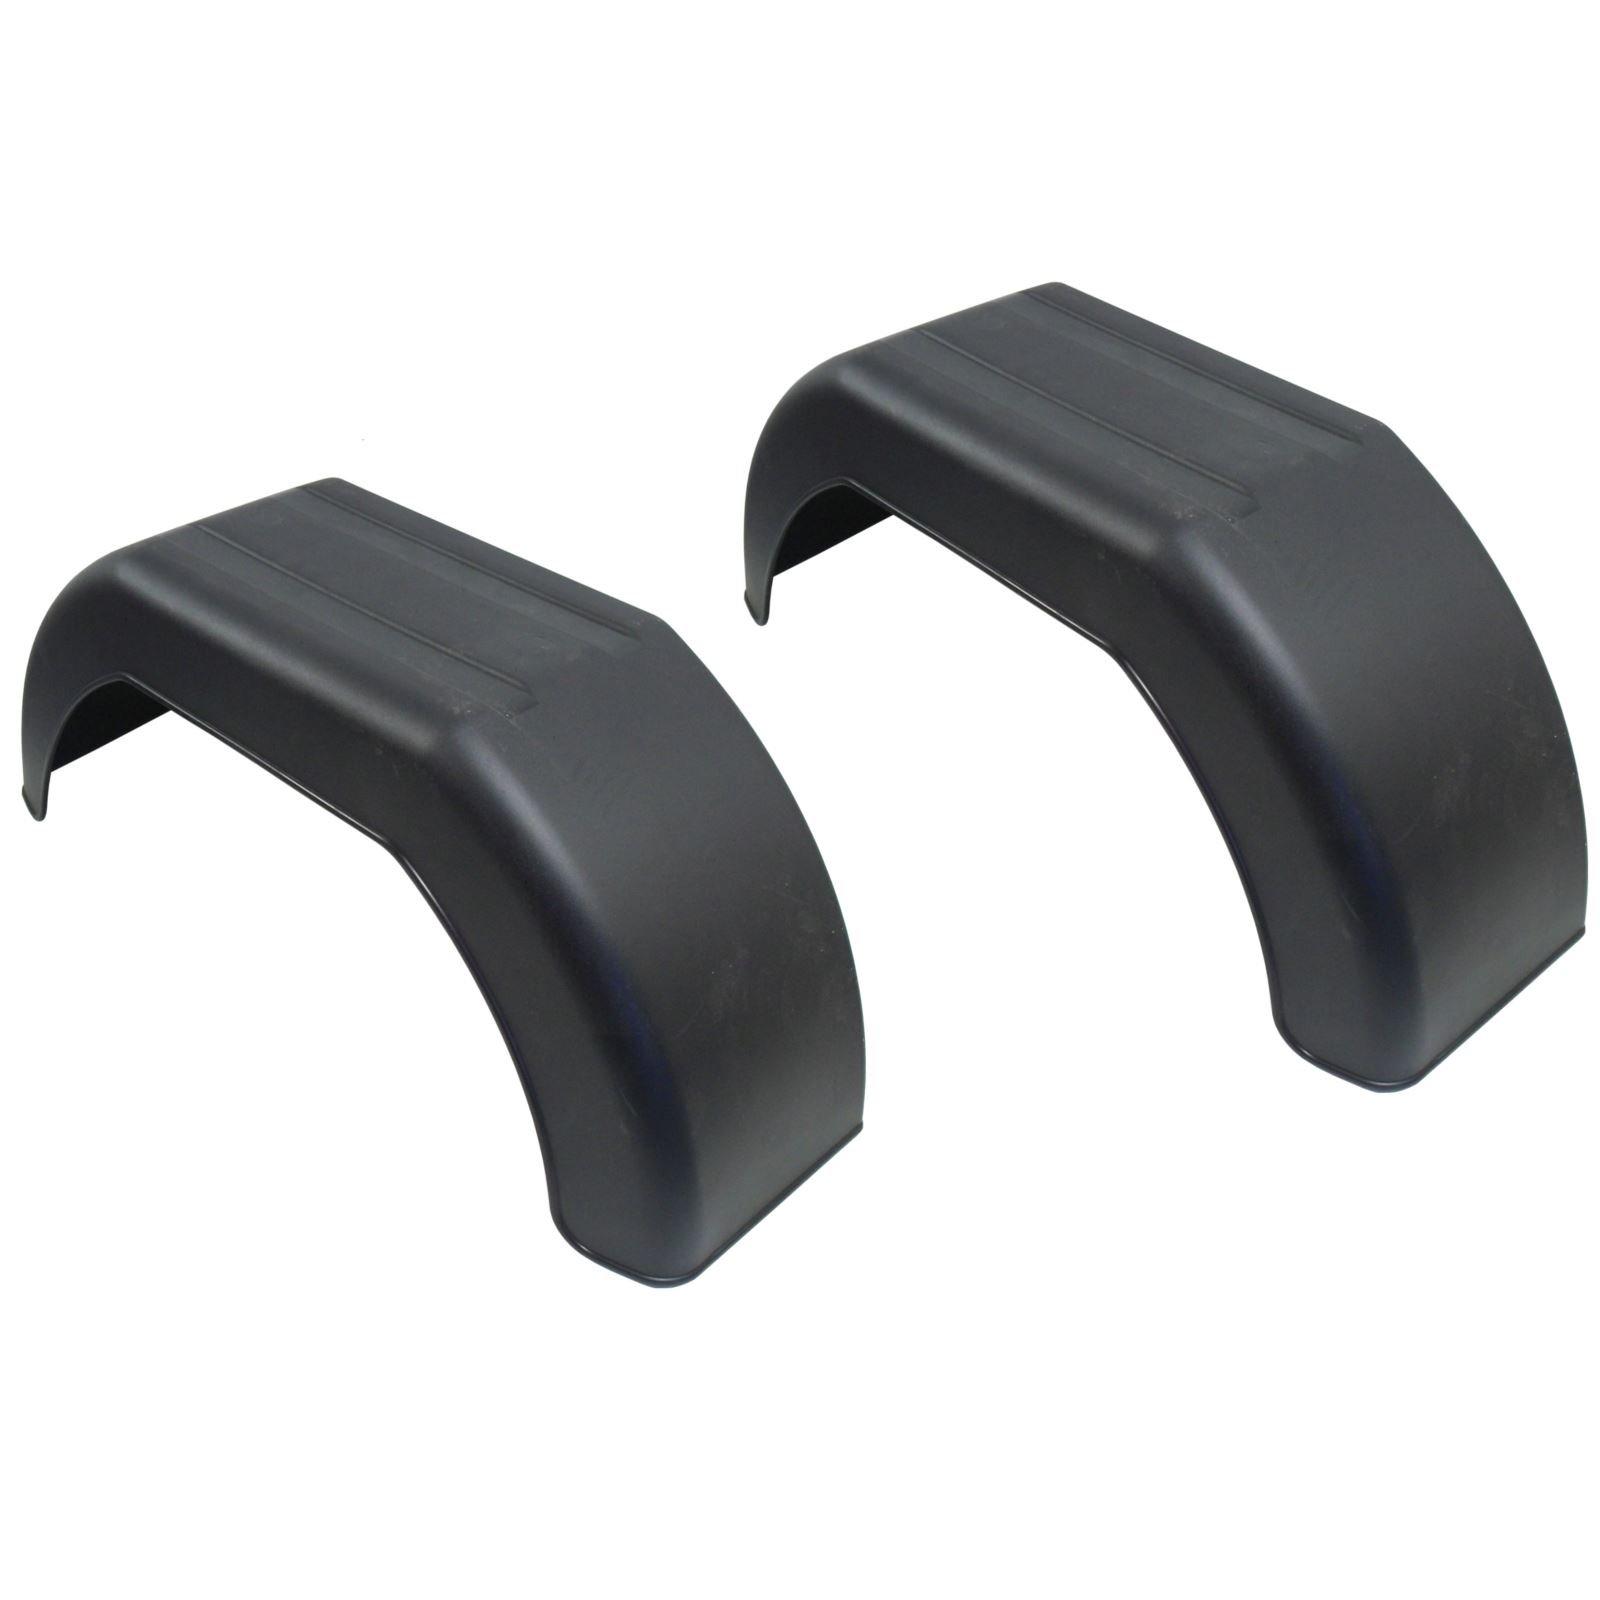 AB Tools-Maypole Mudguard for Trailer Wheels 10'' Plastic Pair/Wing/Fender TR002 by AB Tools-Maypole